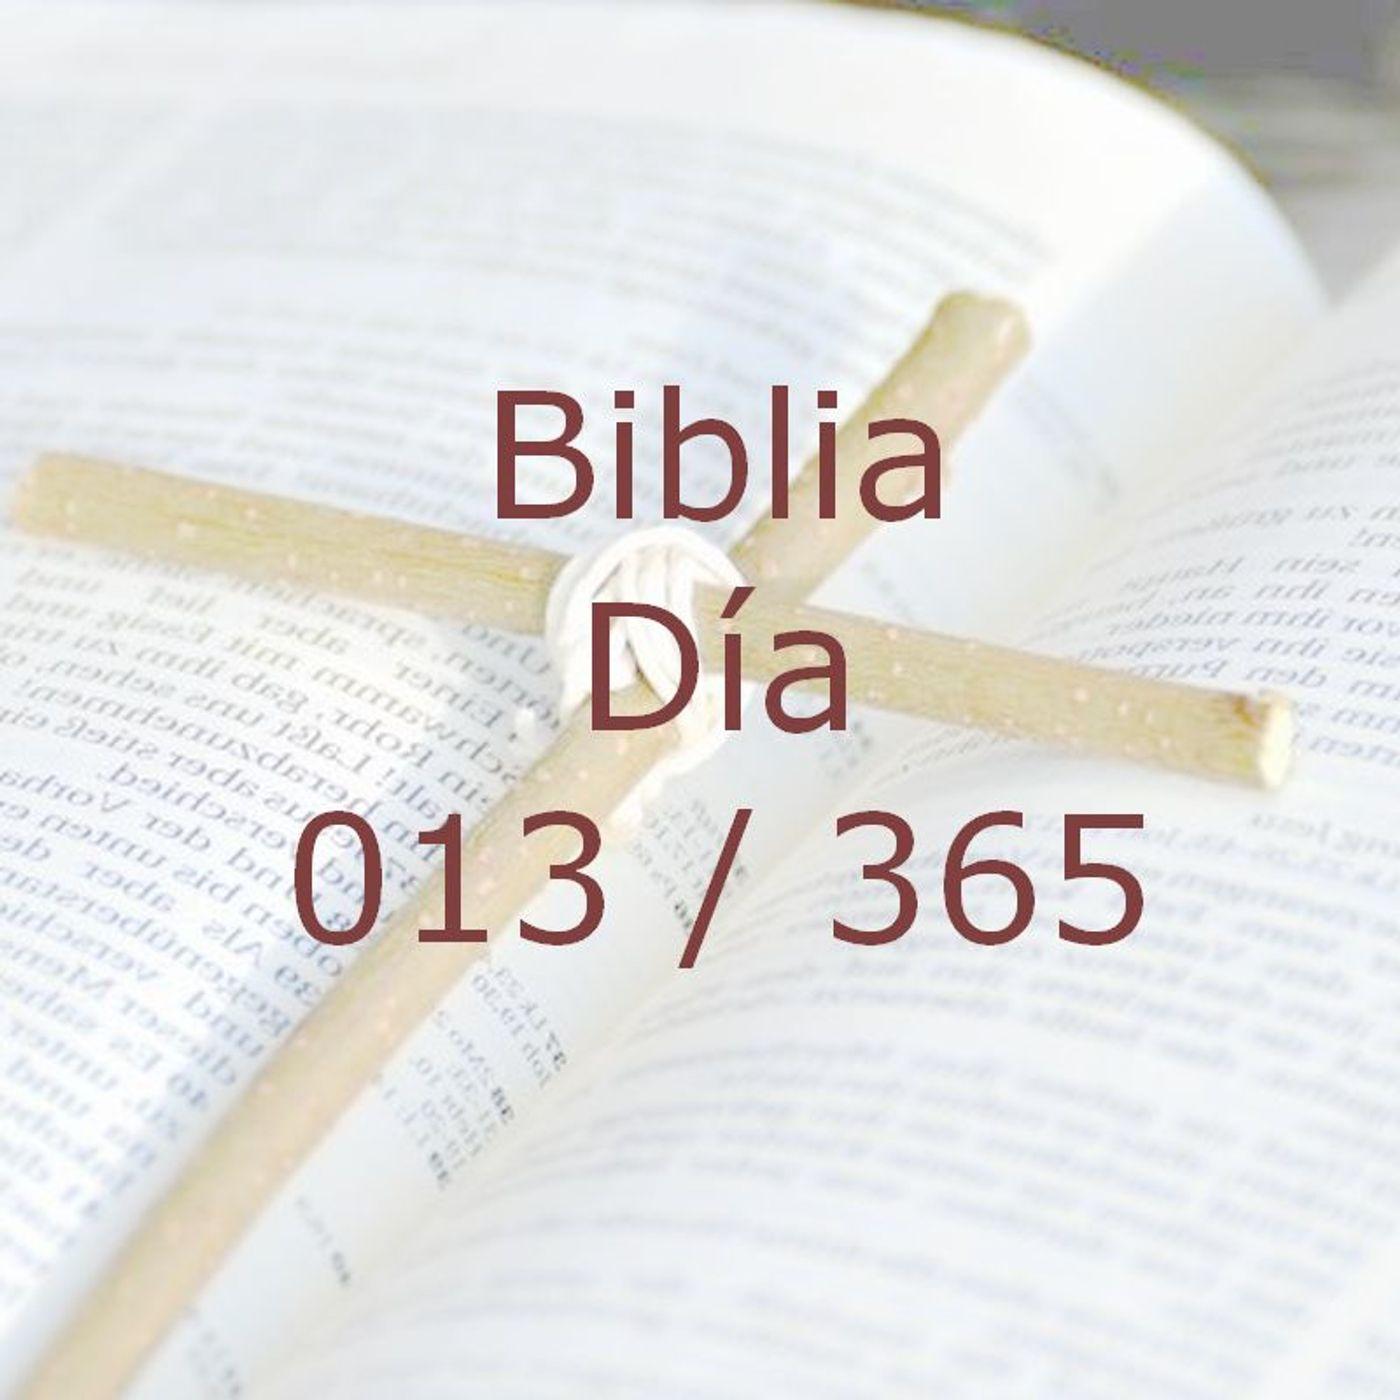 365 dias para la Biblia - Dia 013